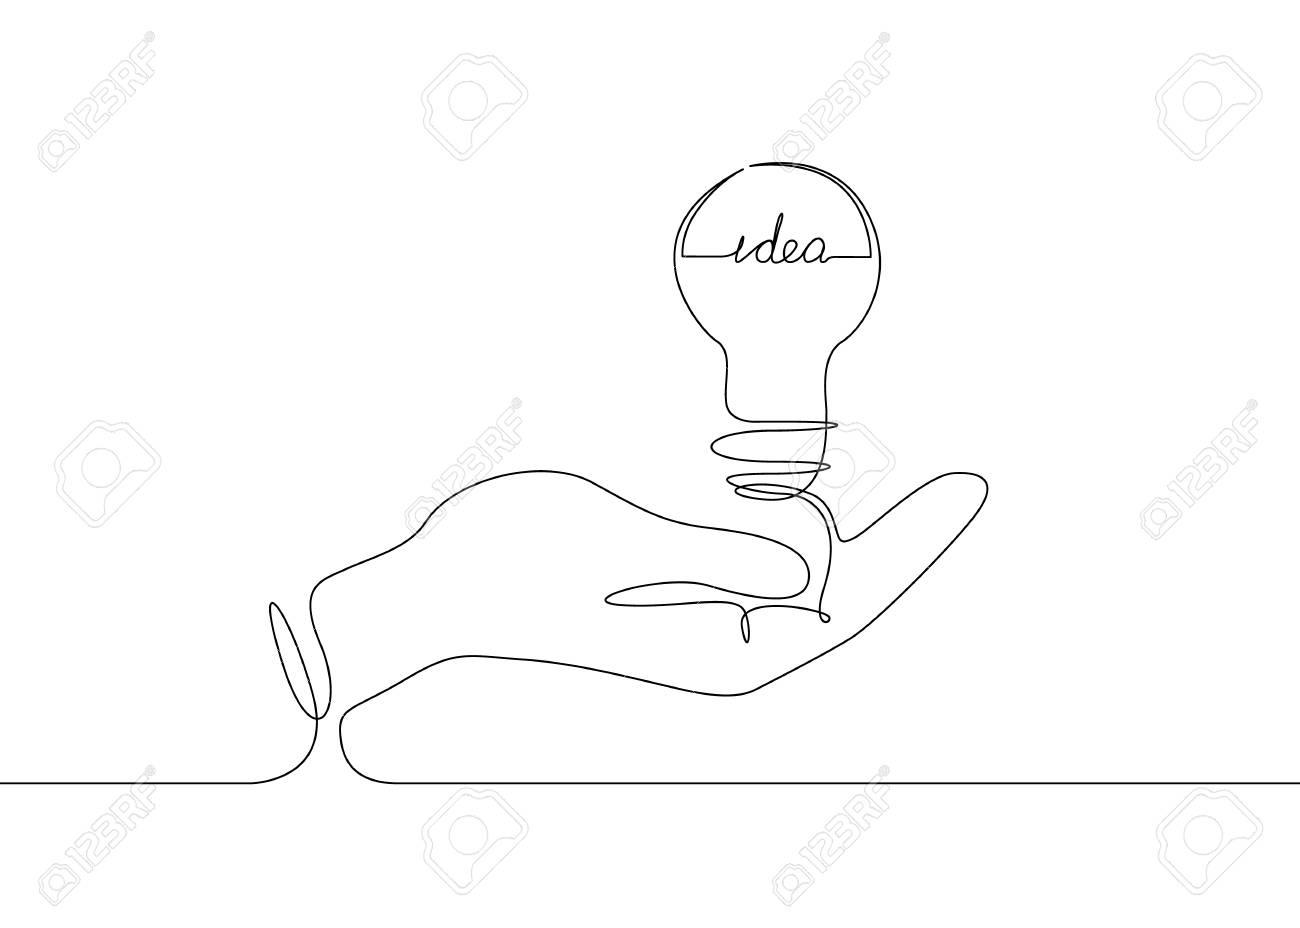 Continuous one line drawing light bulb symbol idea, the inscription idea. - 94537767